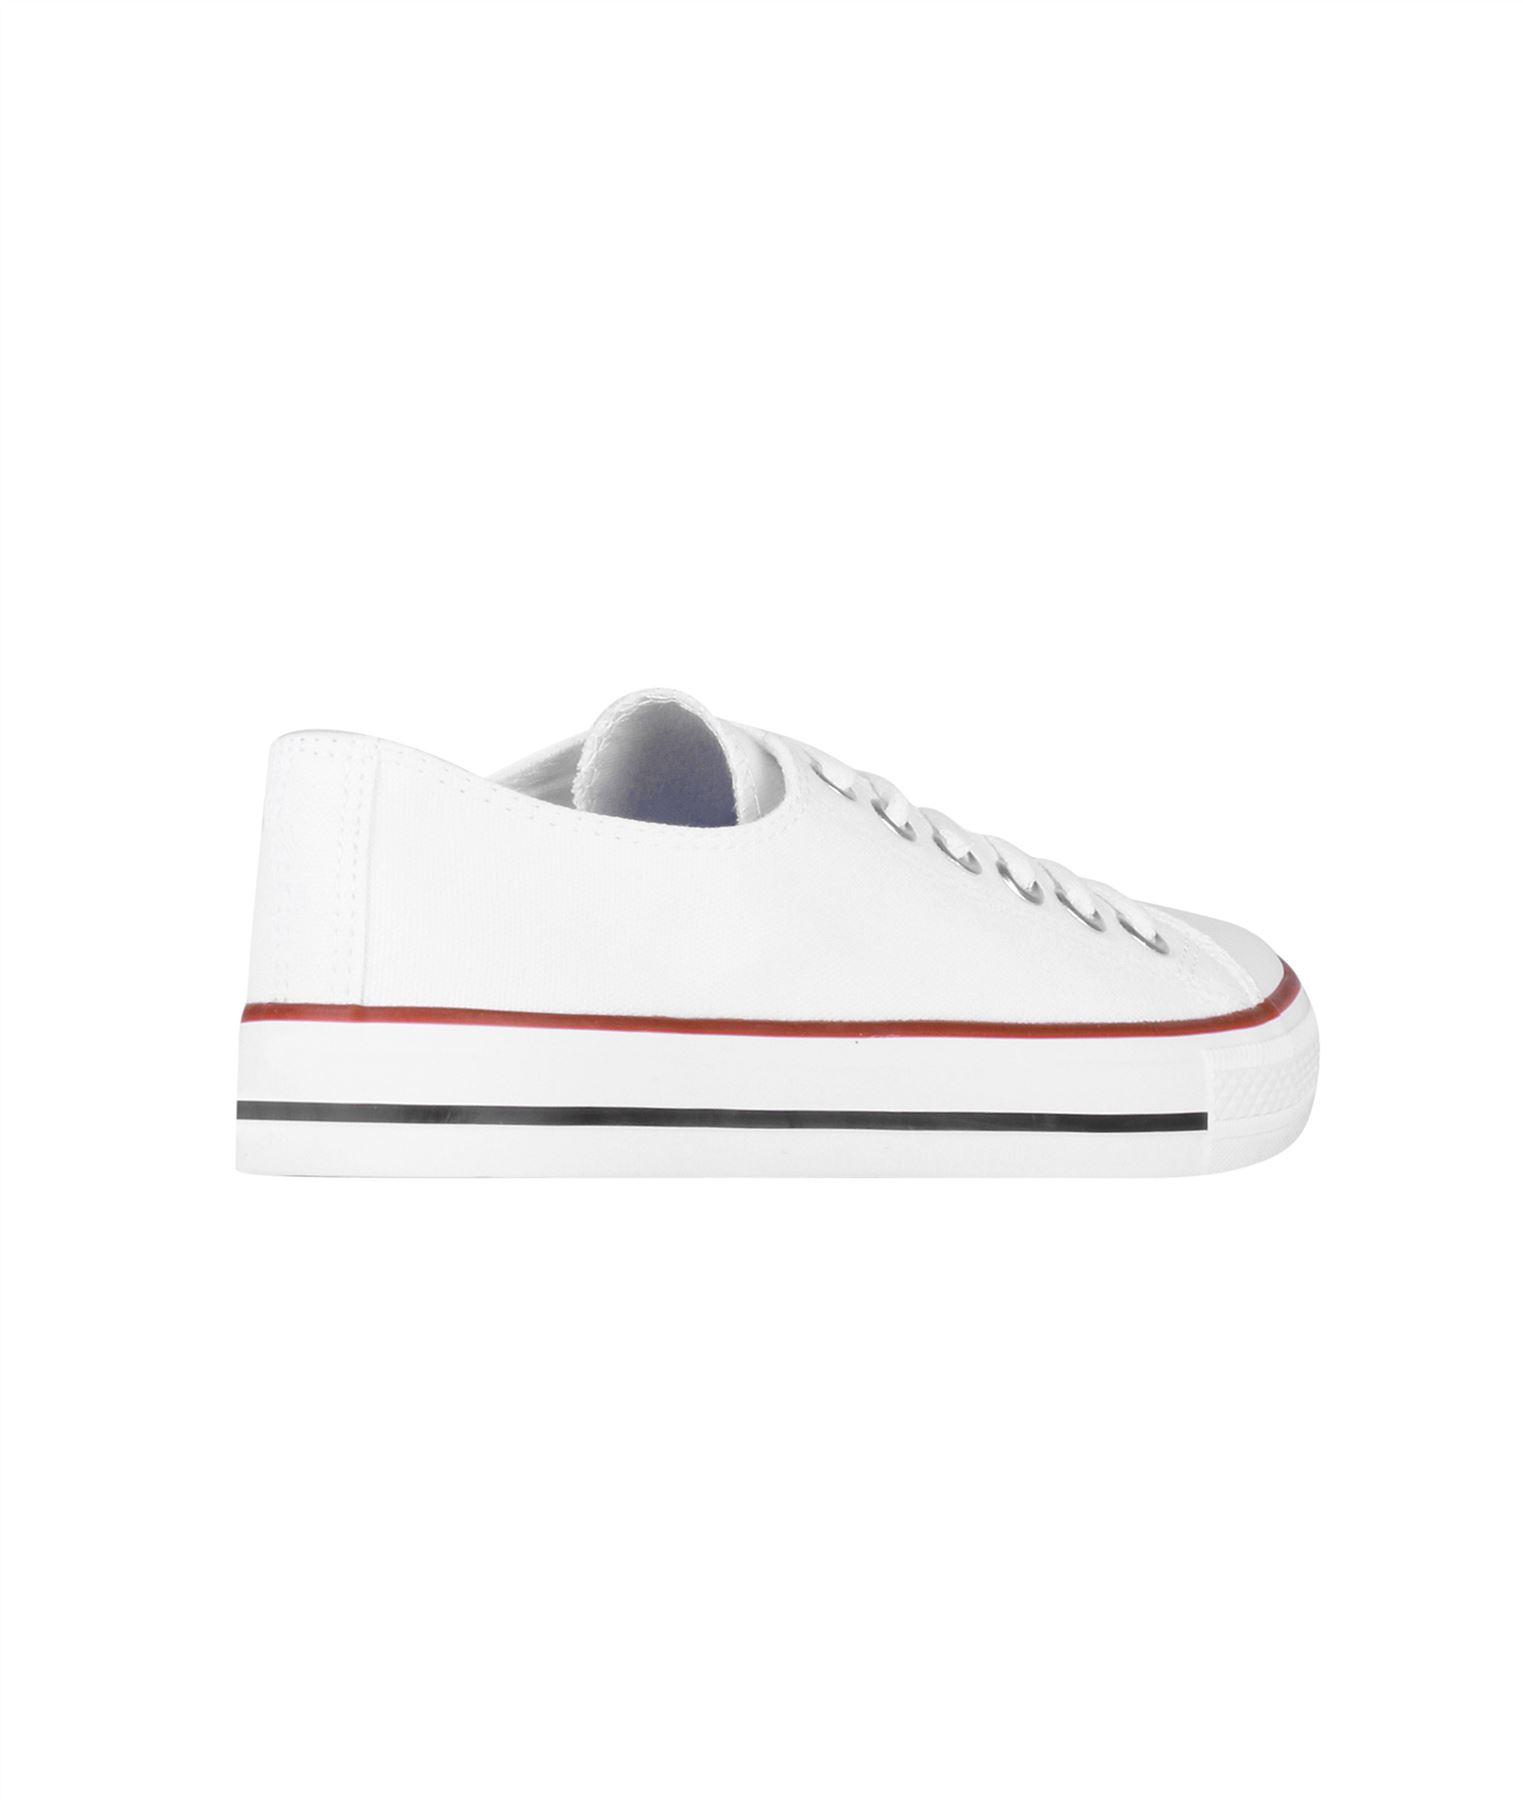 Zapatillas-Mujer-Casuales-Deportiva-Barata-Lona-Moda-Originales-Outlet-Tela-Moda miniatura 10